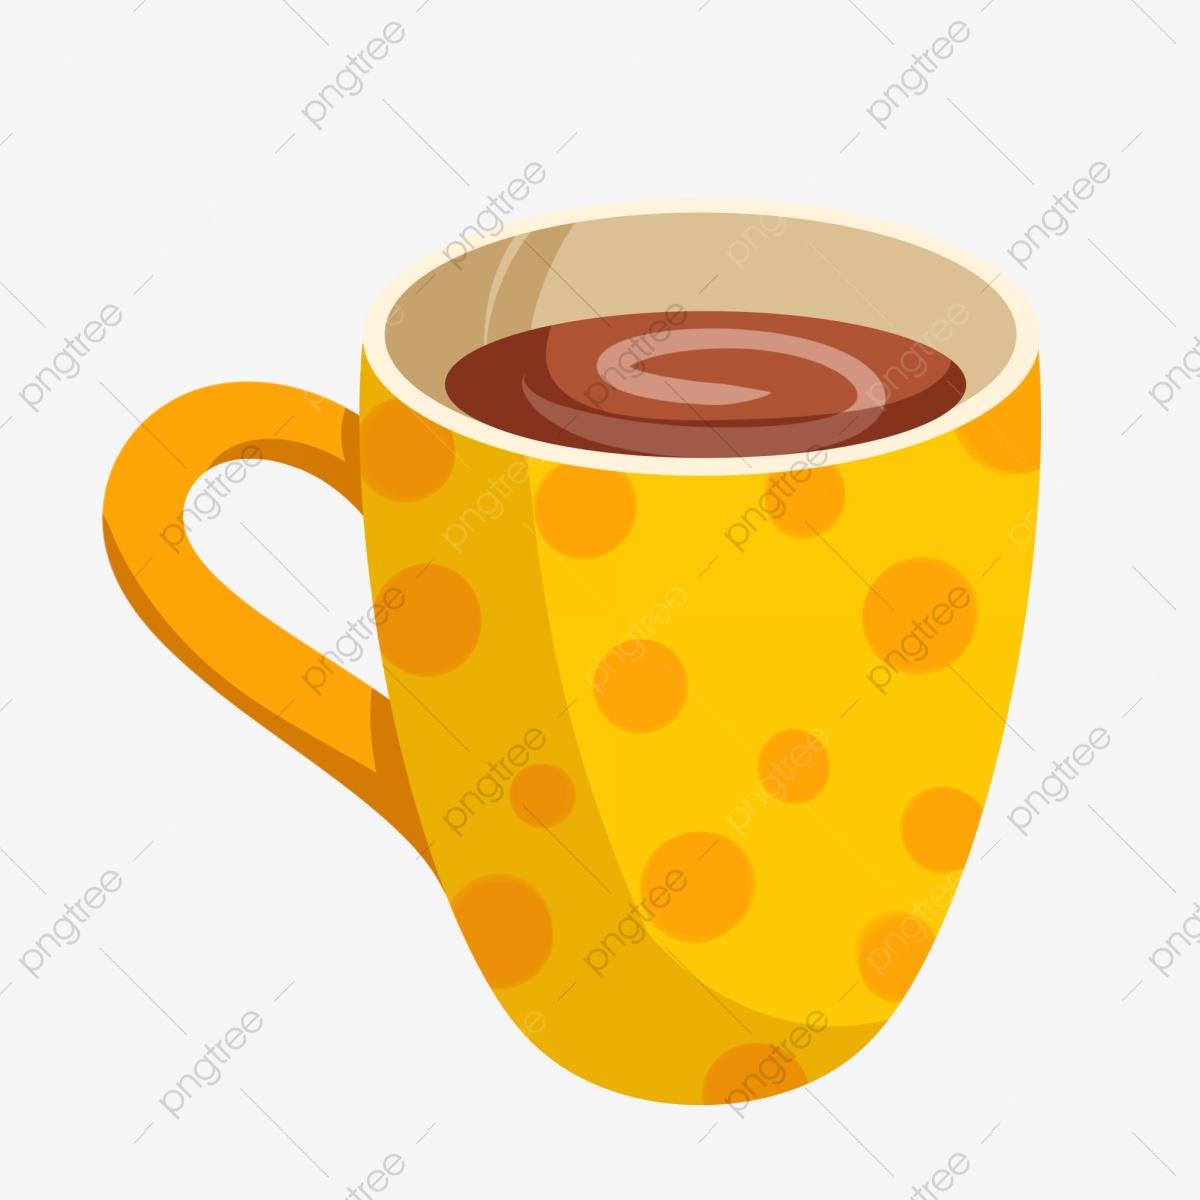 Brown coffee delicious cartoon. Mug clipart yellow cup